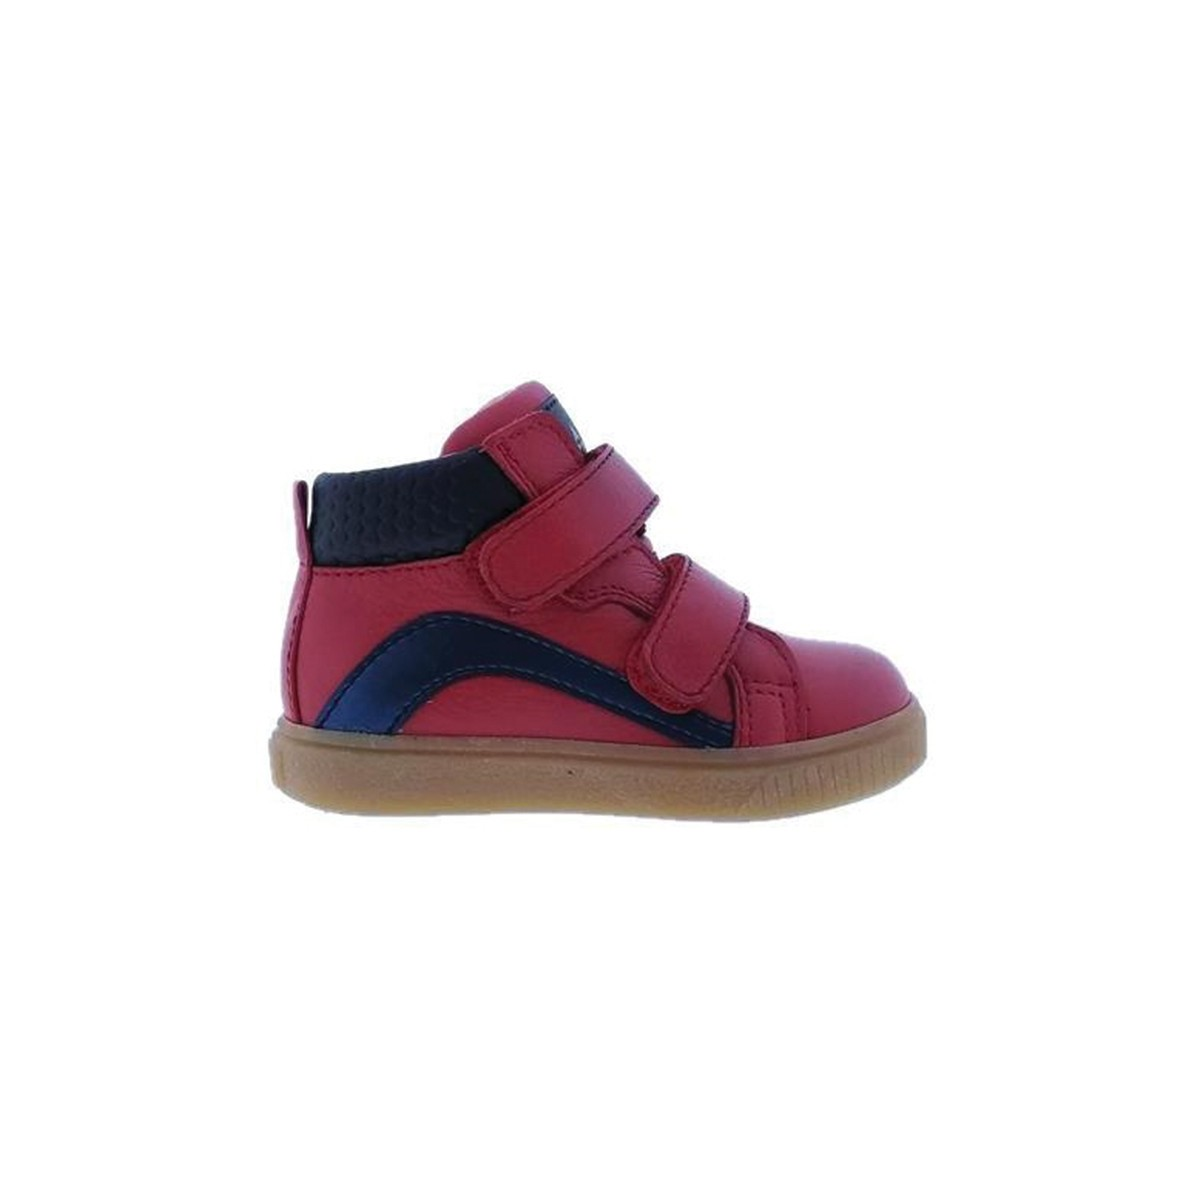 Basket Acebos cuir montante bi color Rouge